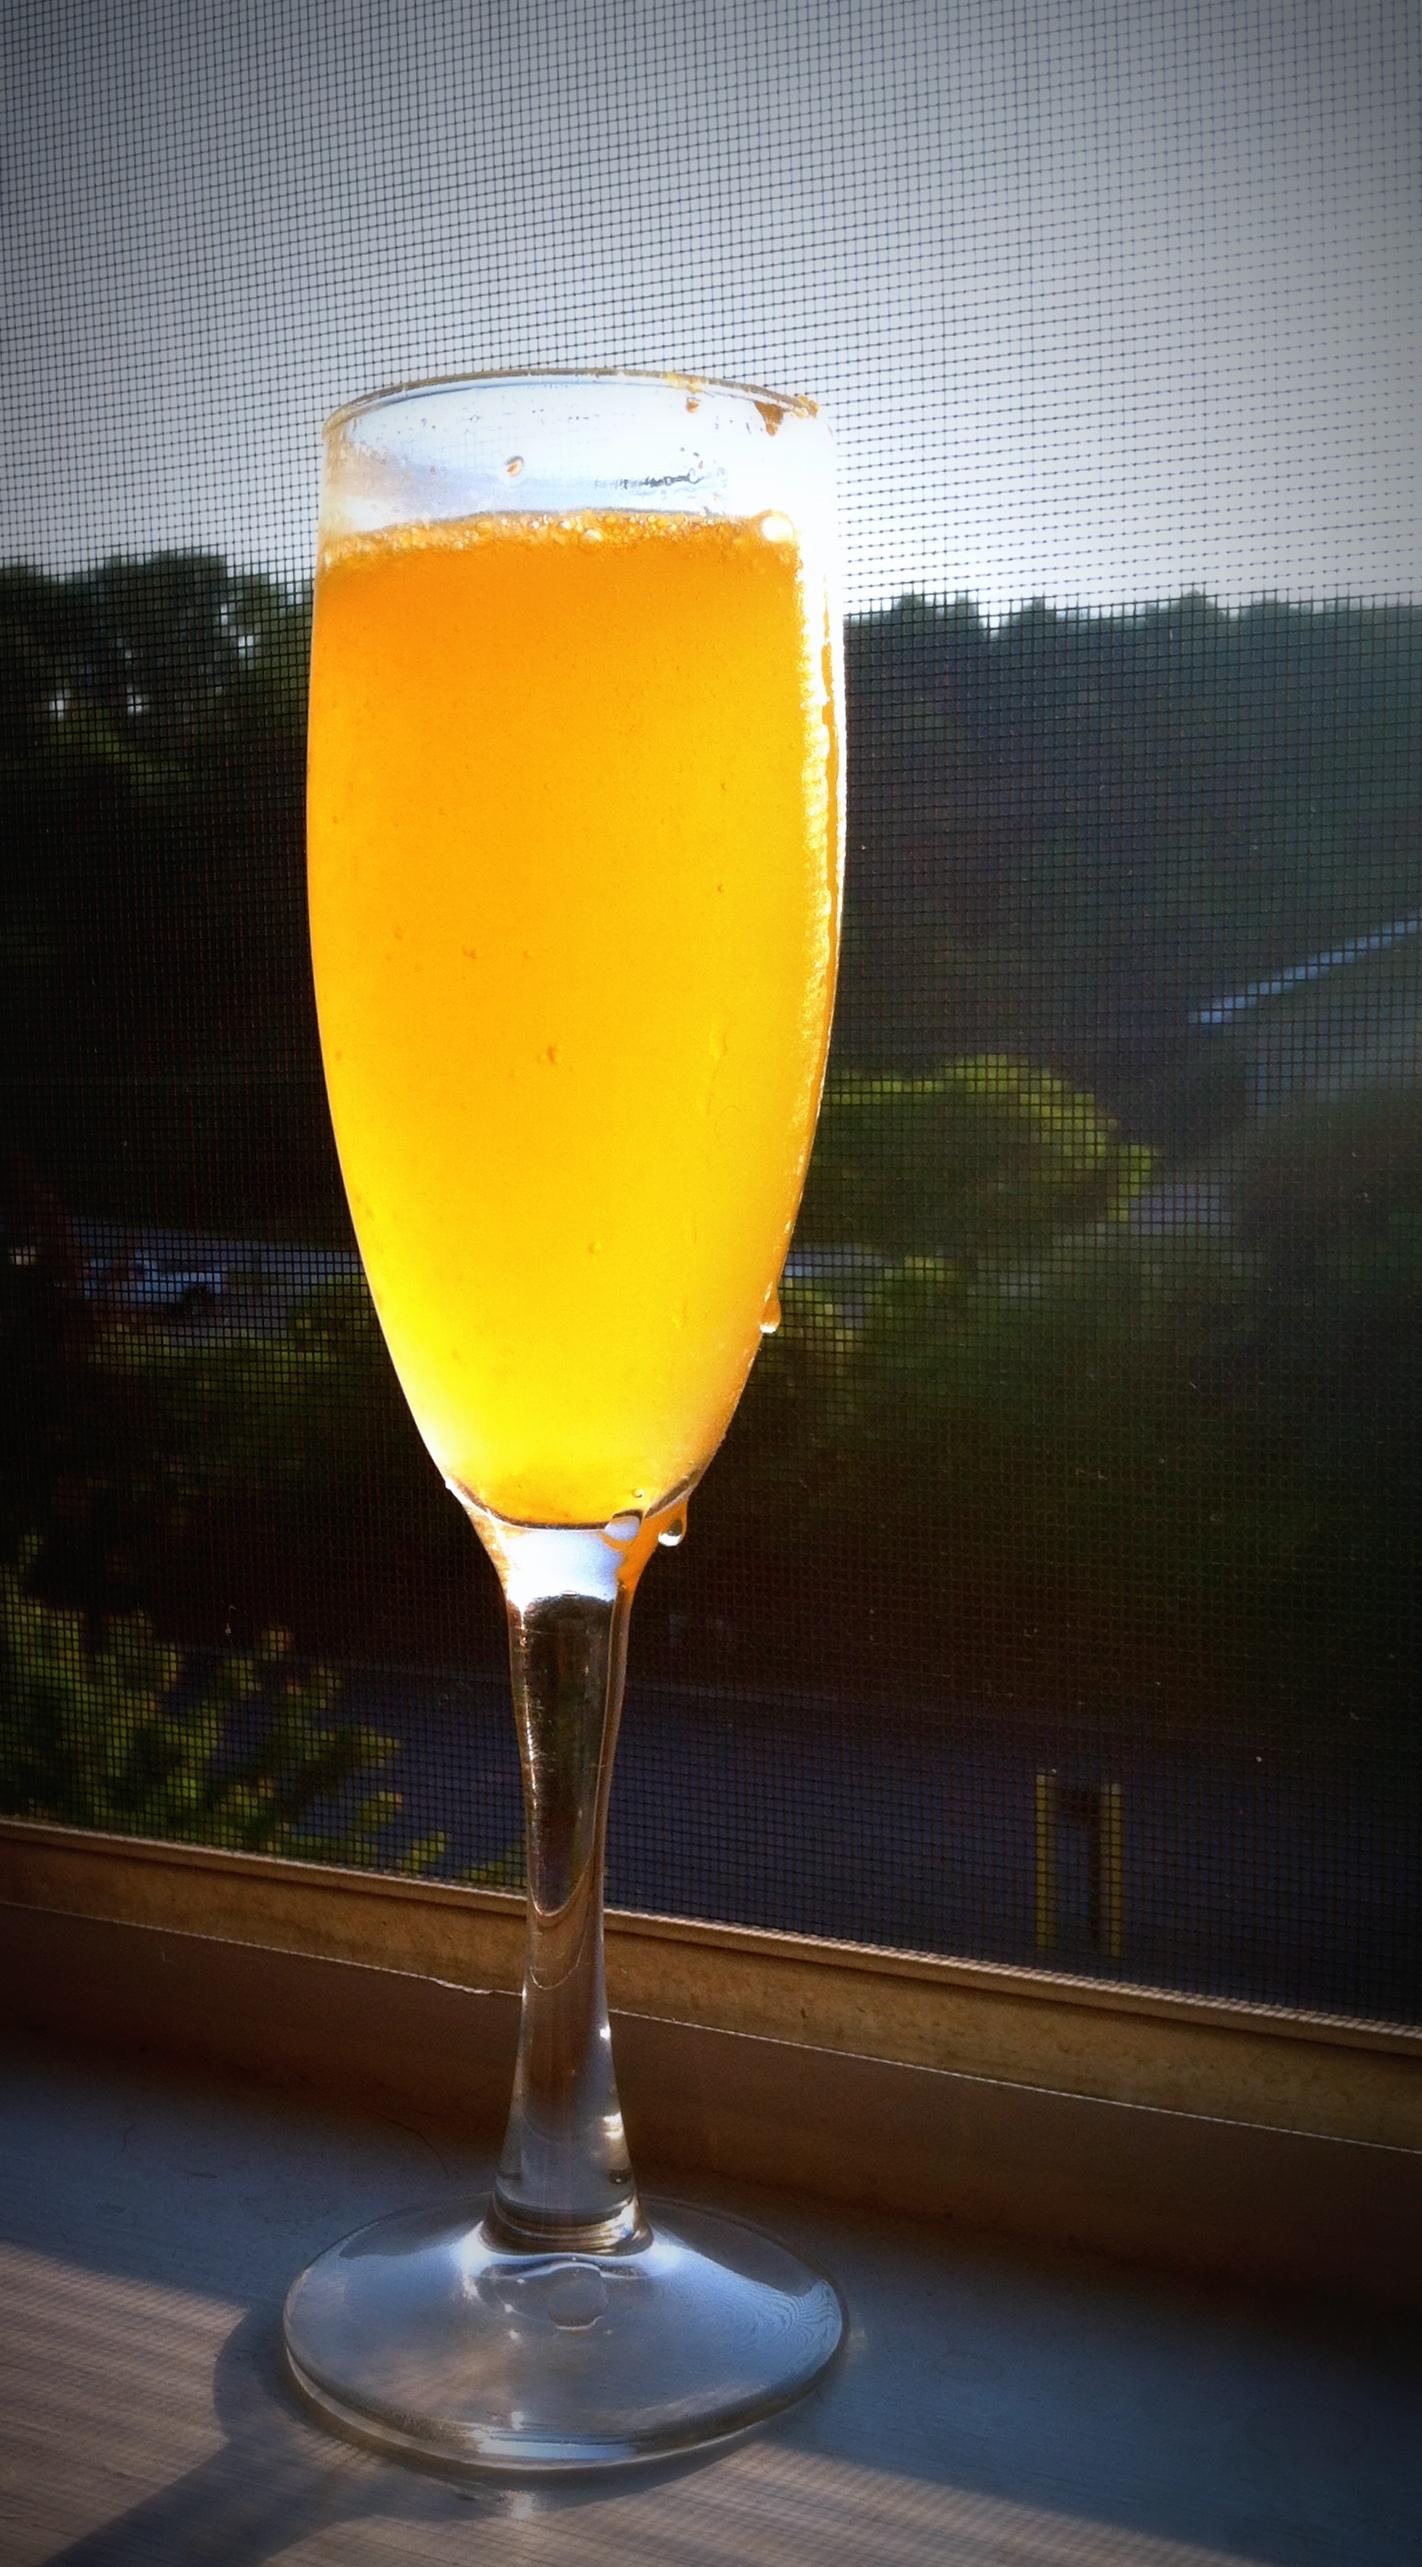 Mimosa Brunch Insert, the mimosa.